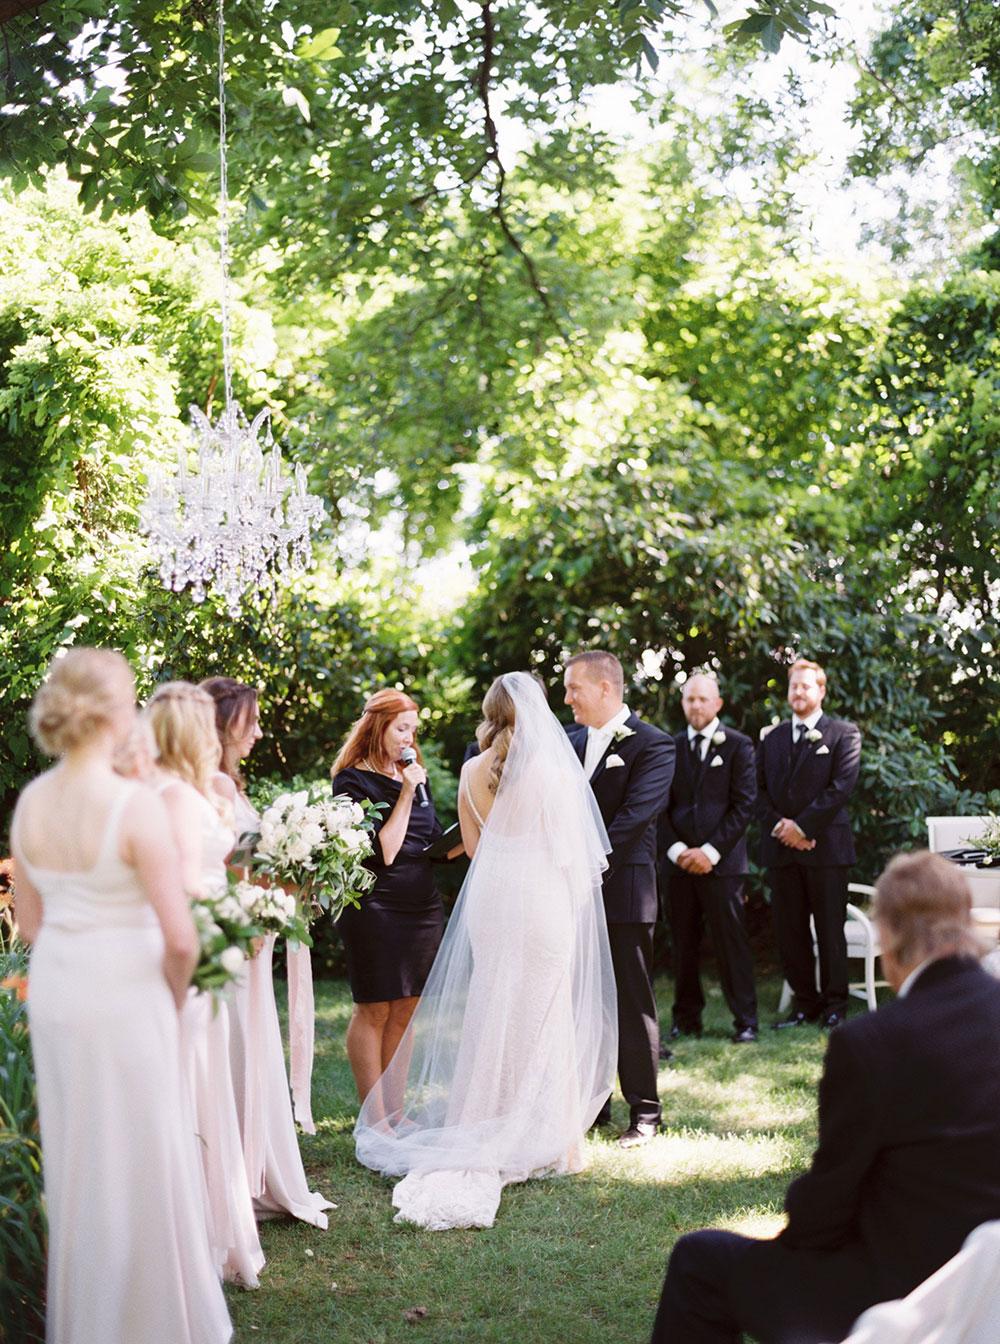 kurtz-orchards-wedding-gracewood-estate-niagara-on-the-lake-photo-by-katie-nicolle-photography-0025.jpeg